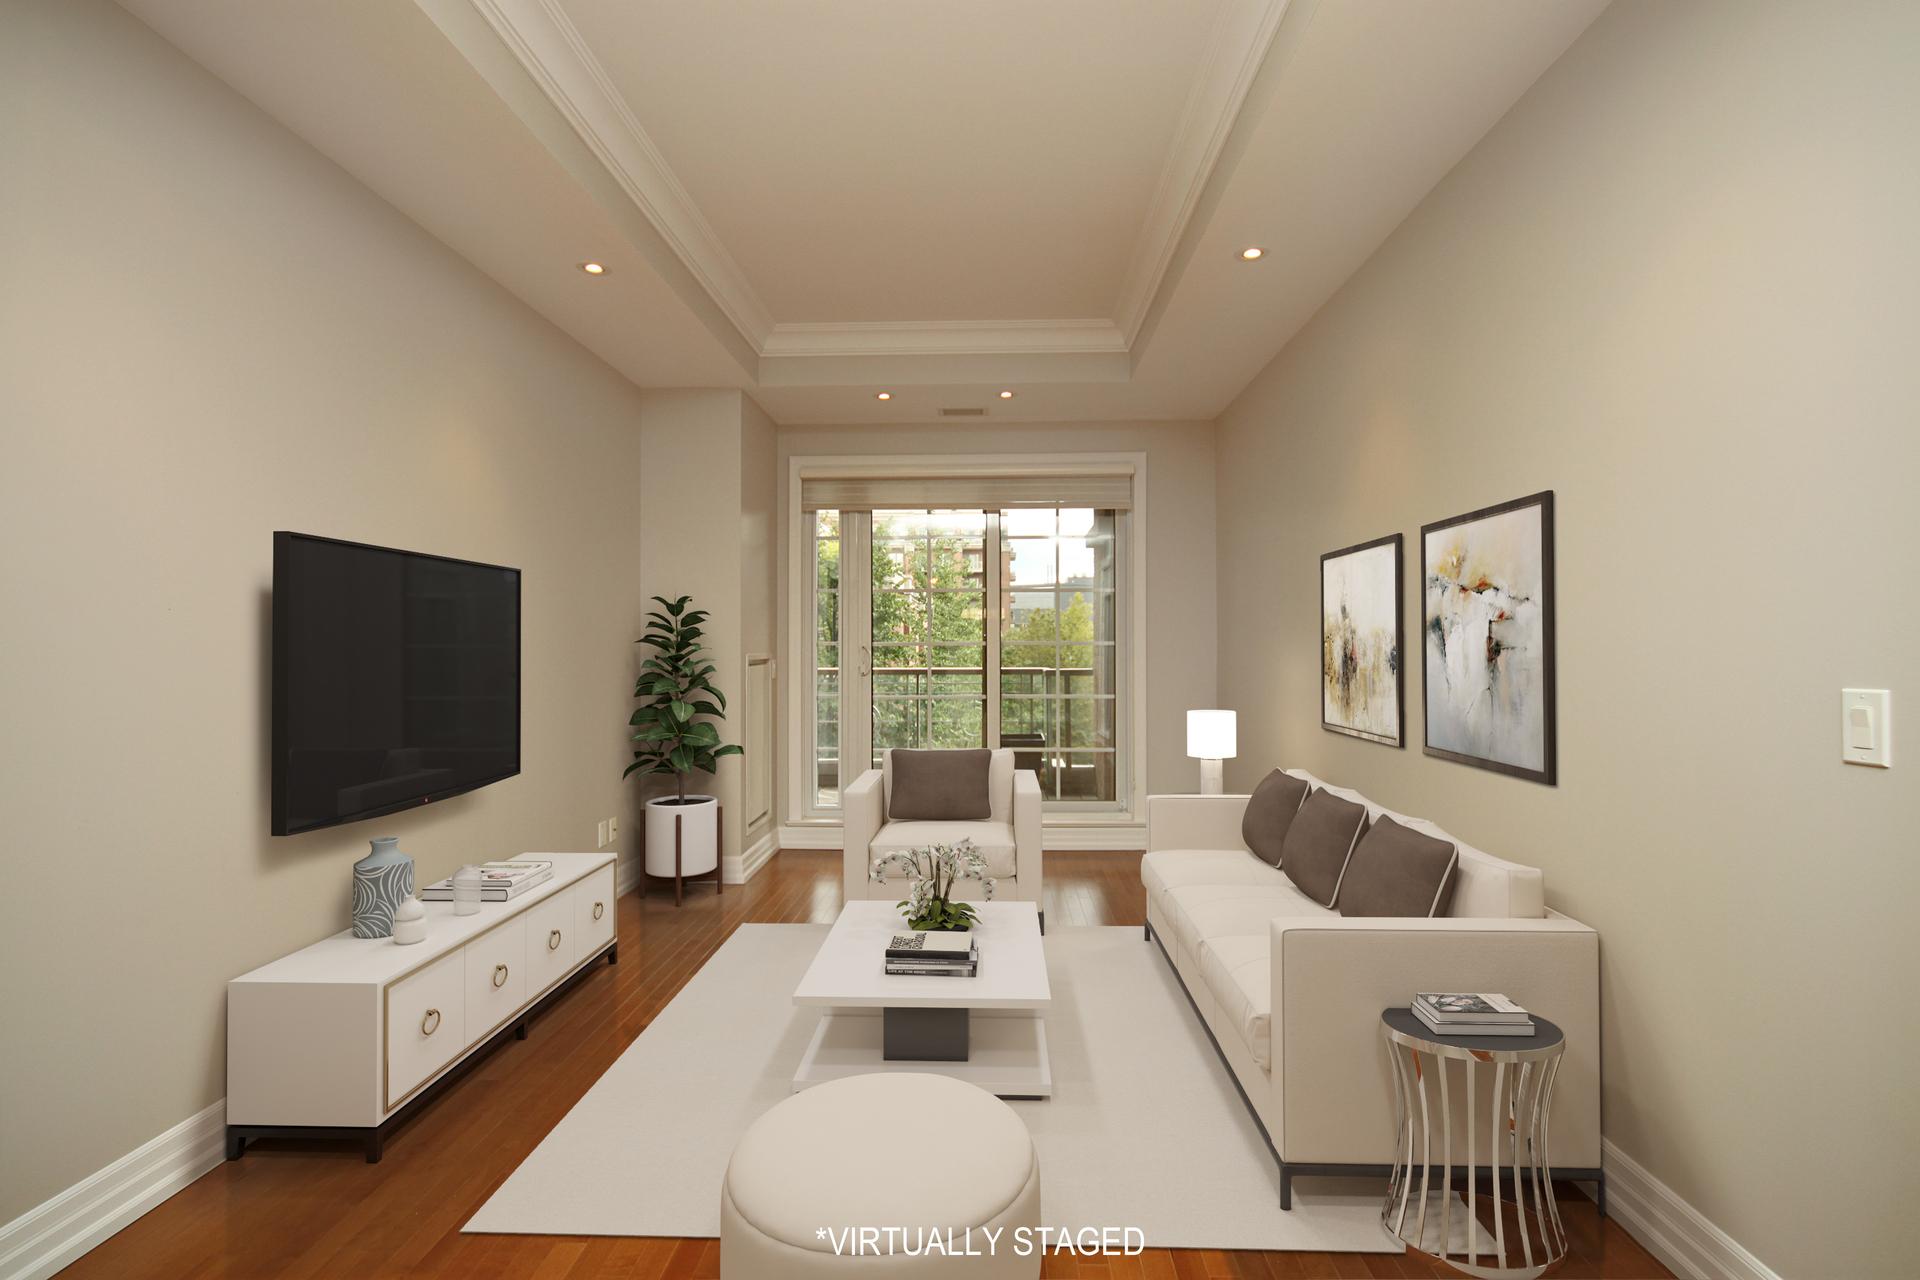 Living Room Virtually Staged at 302 - 20 Burkebrook Place, Bridle Path-Sunnybrook-York Mills, Toronto